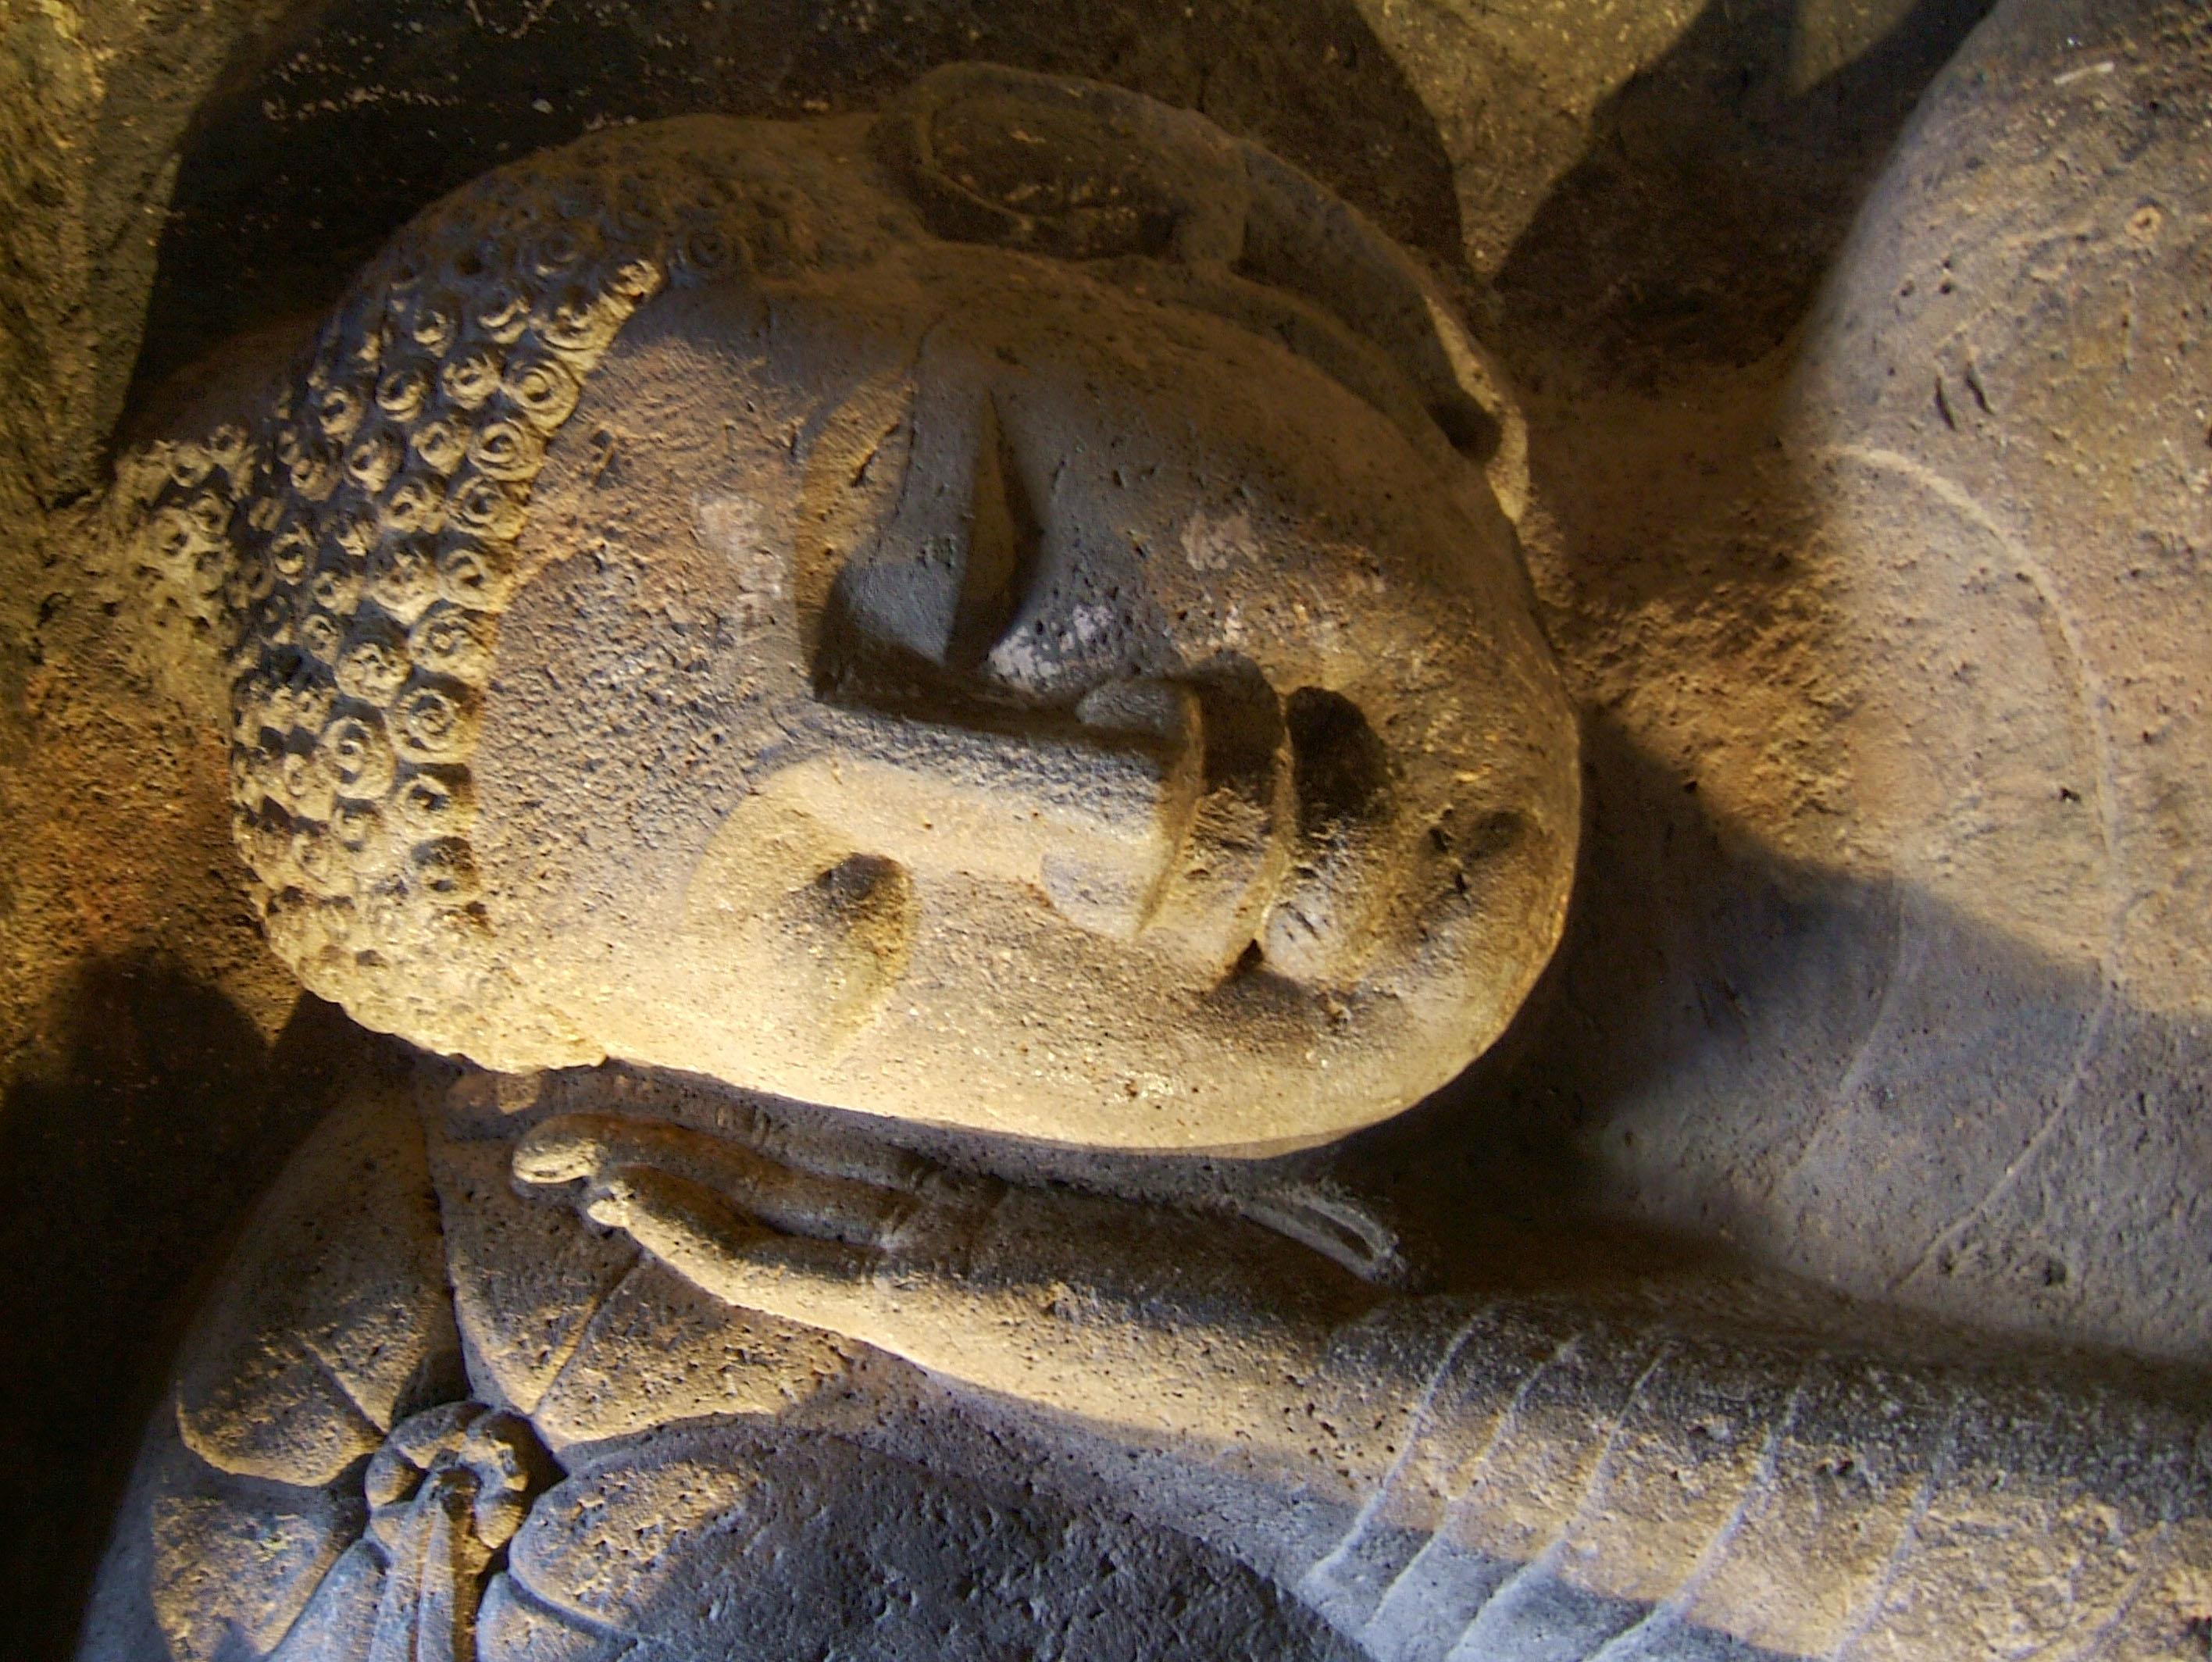 Marathwada Ajanta Caves Buddha carvings India Apr 2004 07